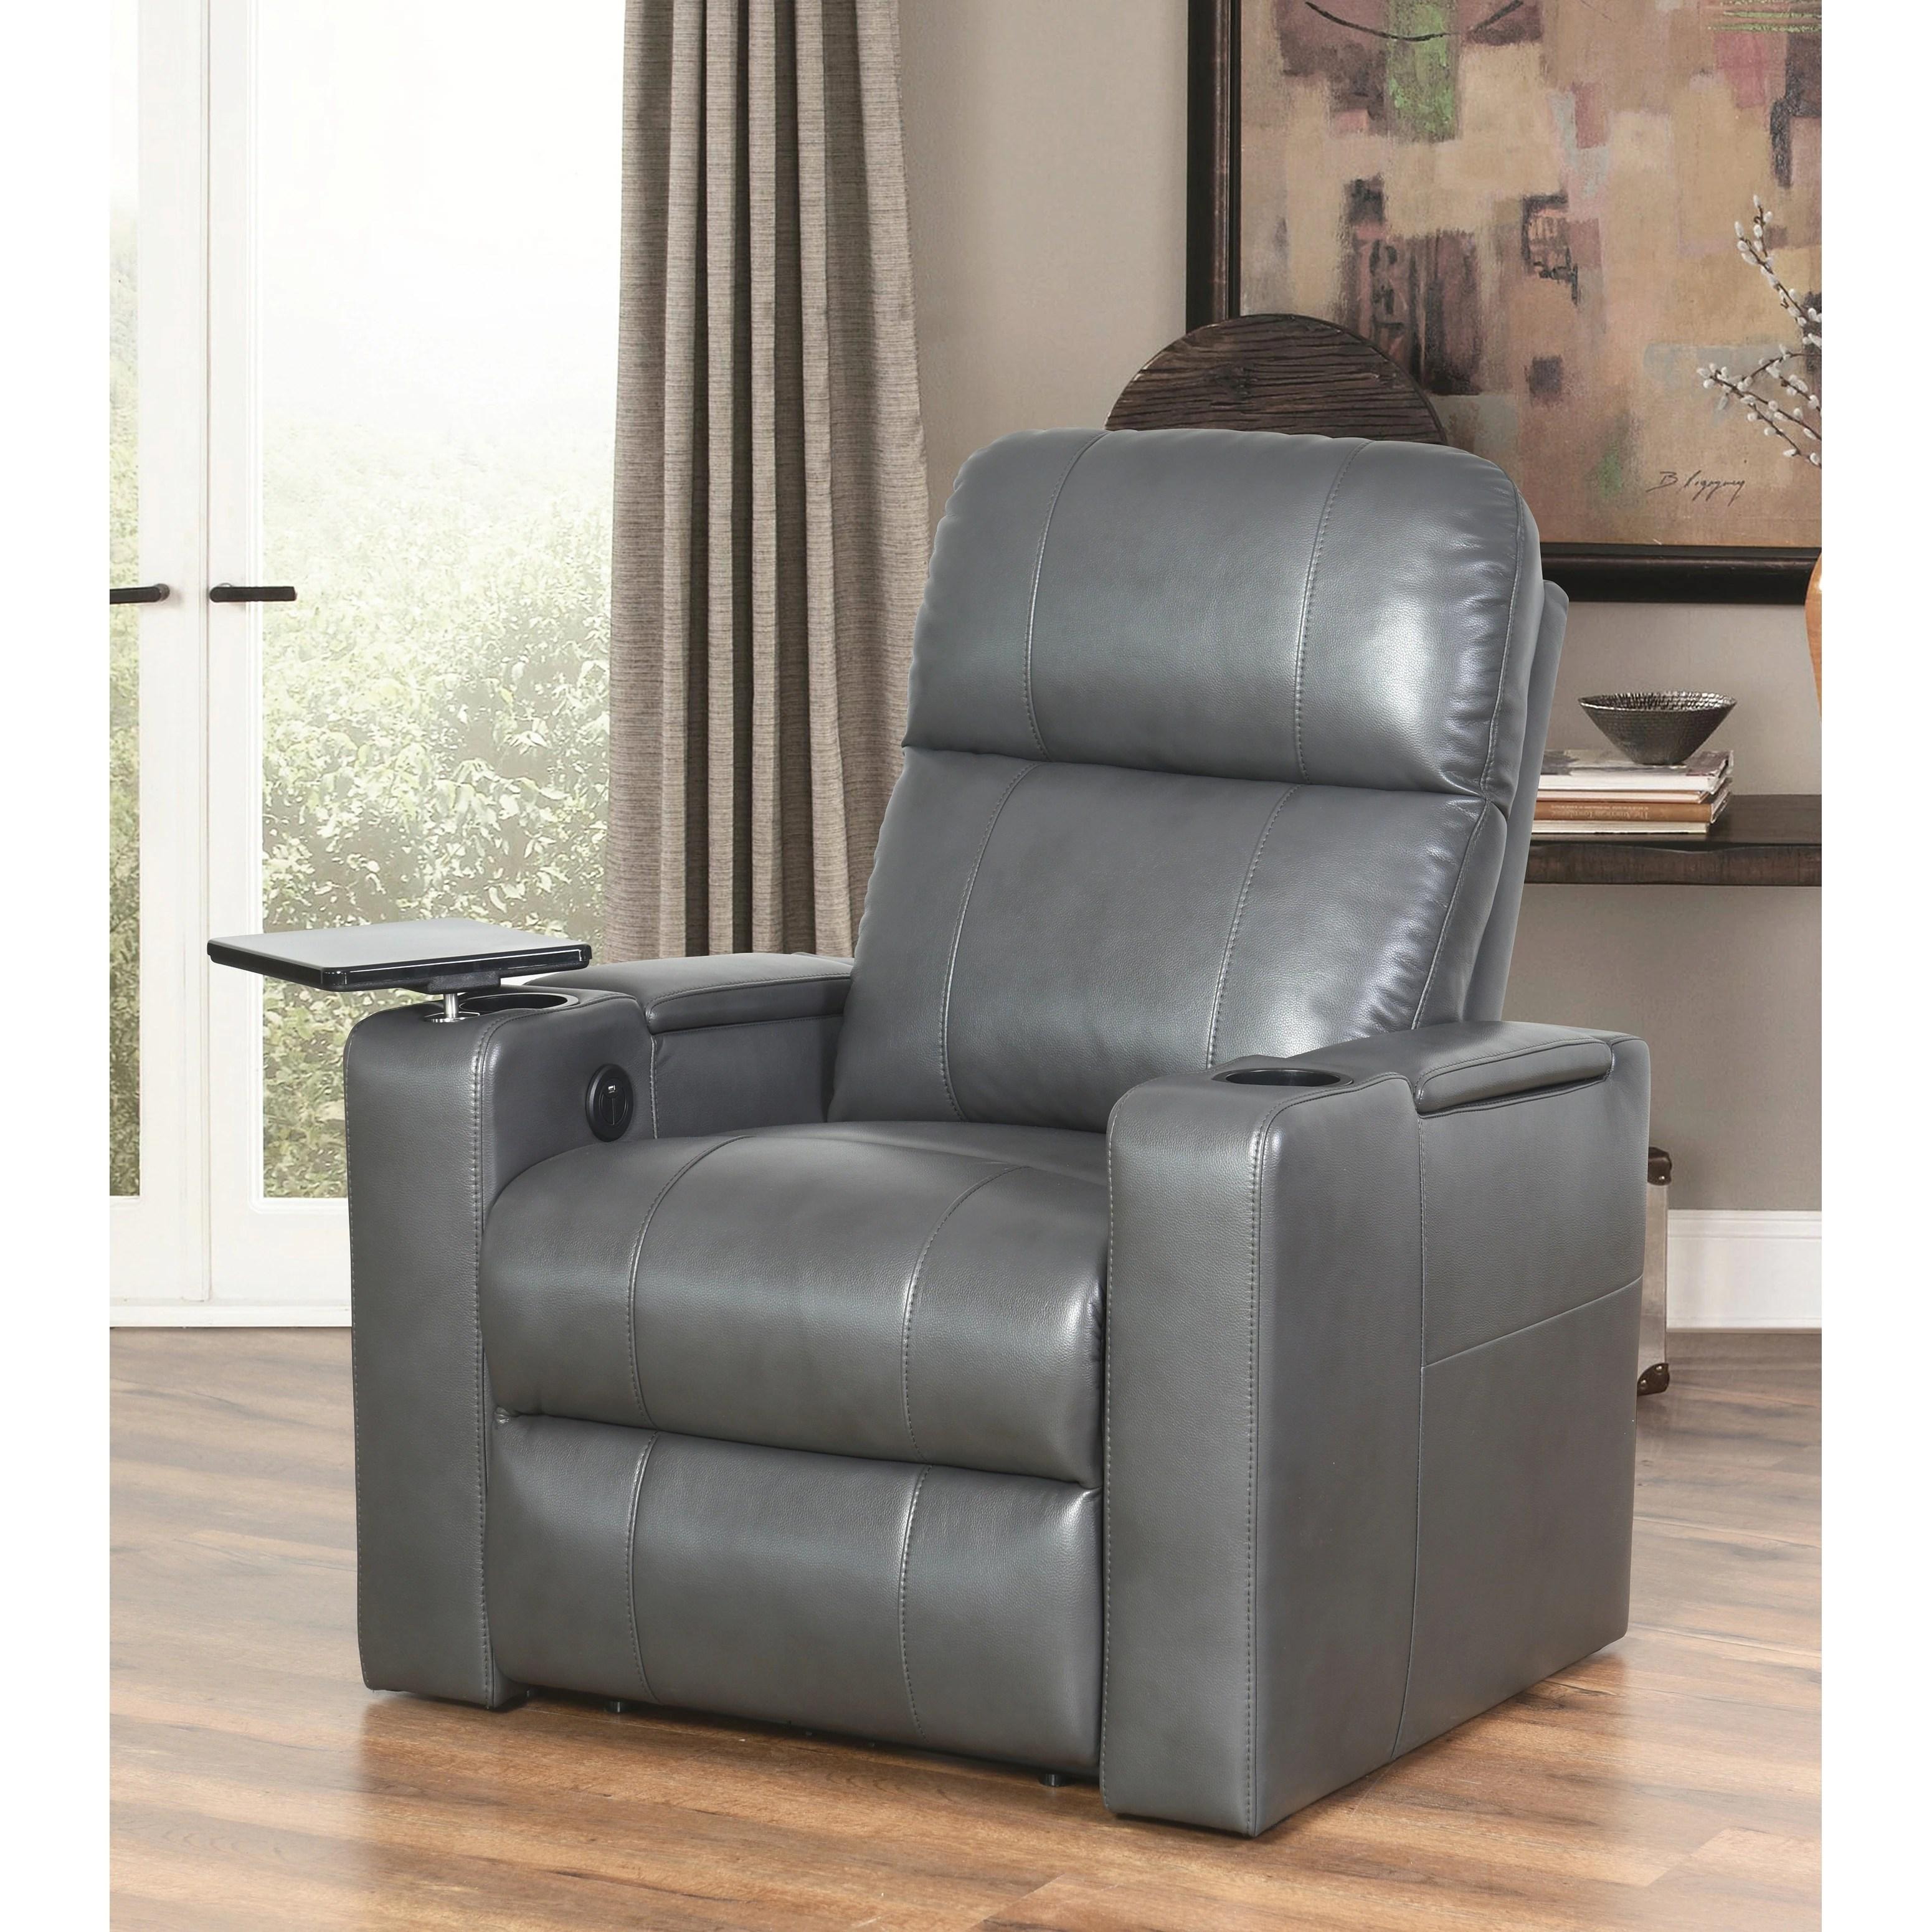 abbyson living bradford faux leather reclining sofa dark brown steel legs rider theater recliner ebay